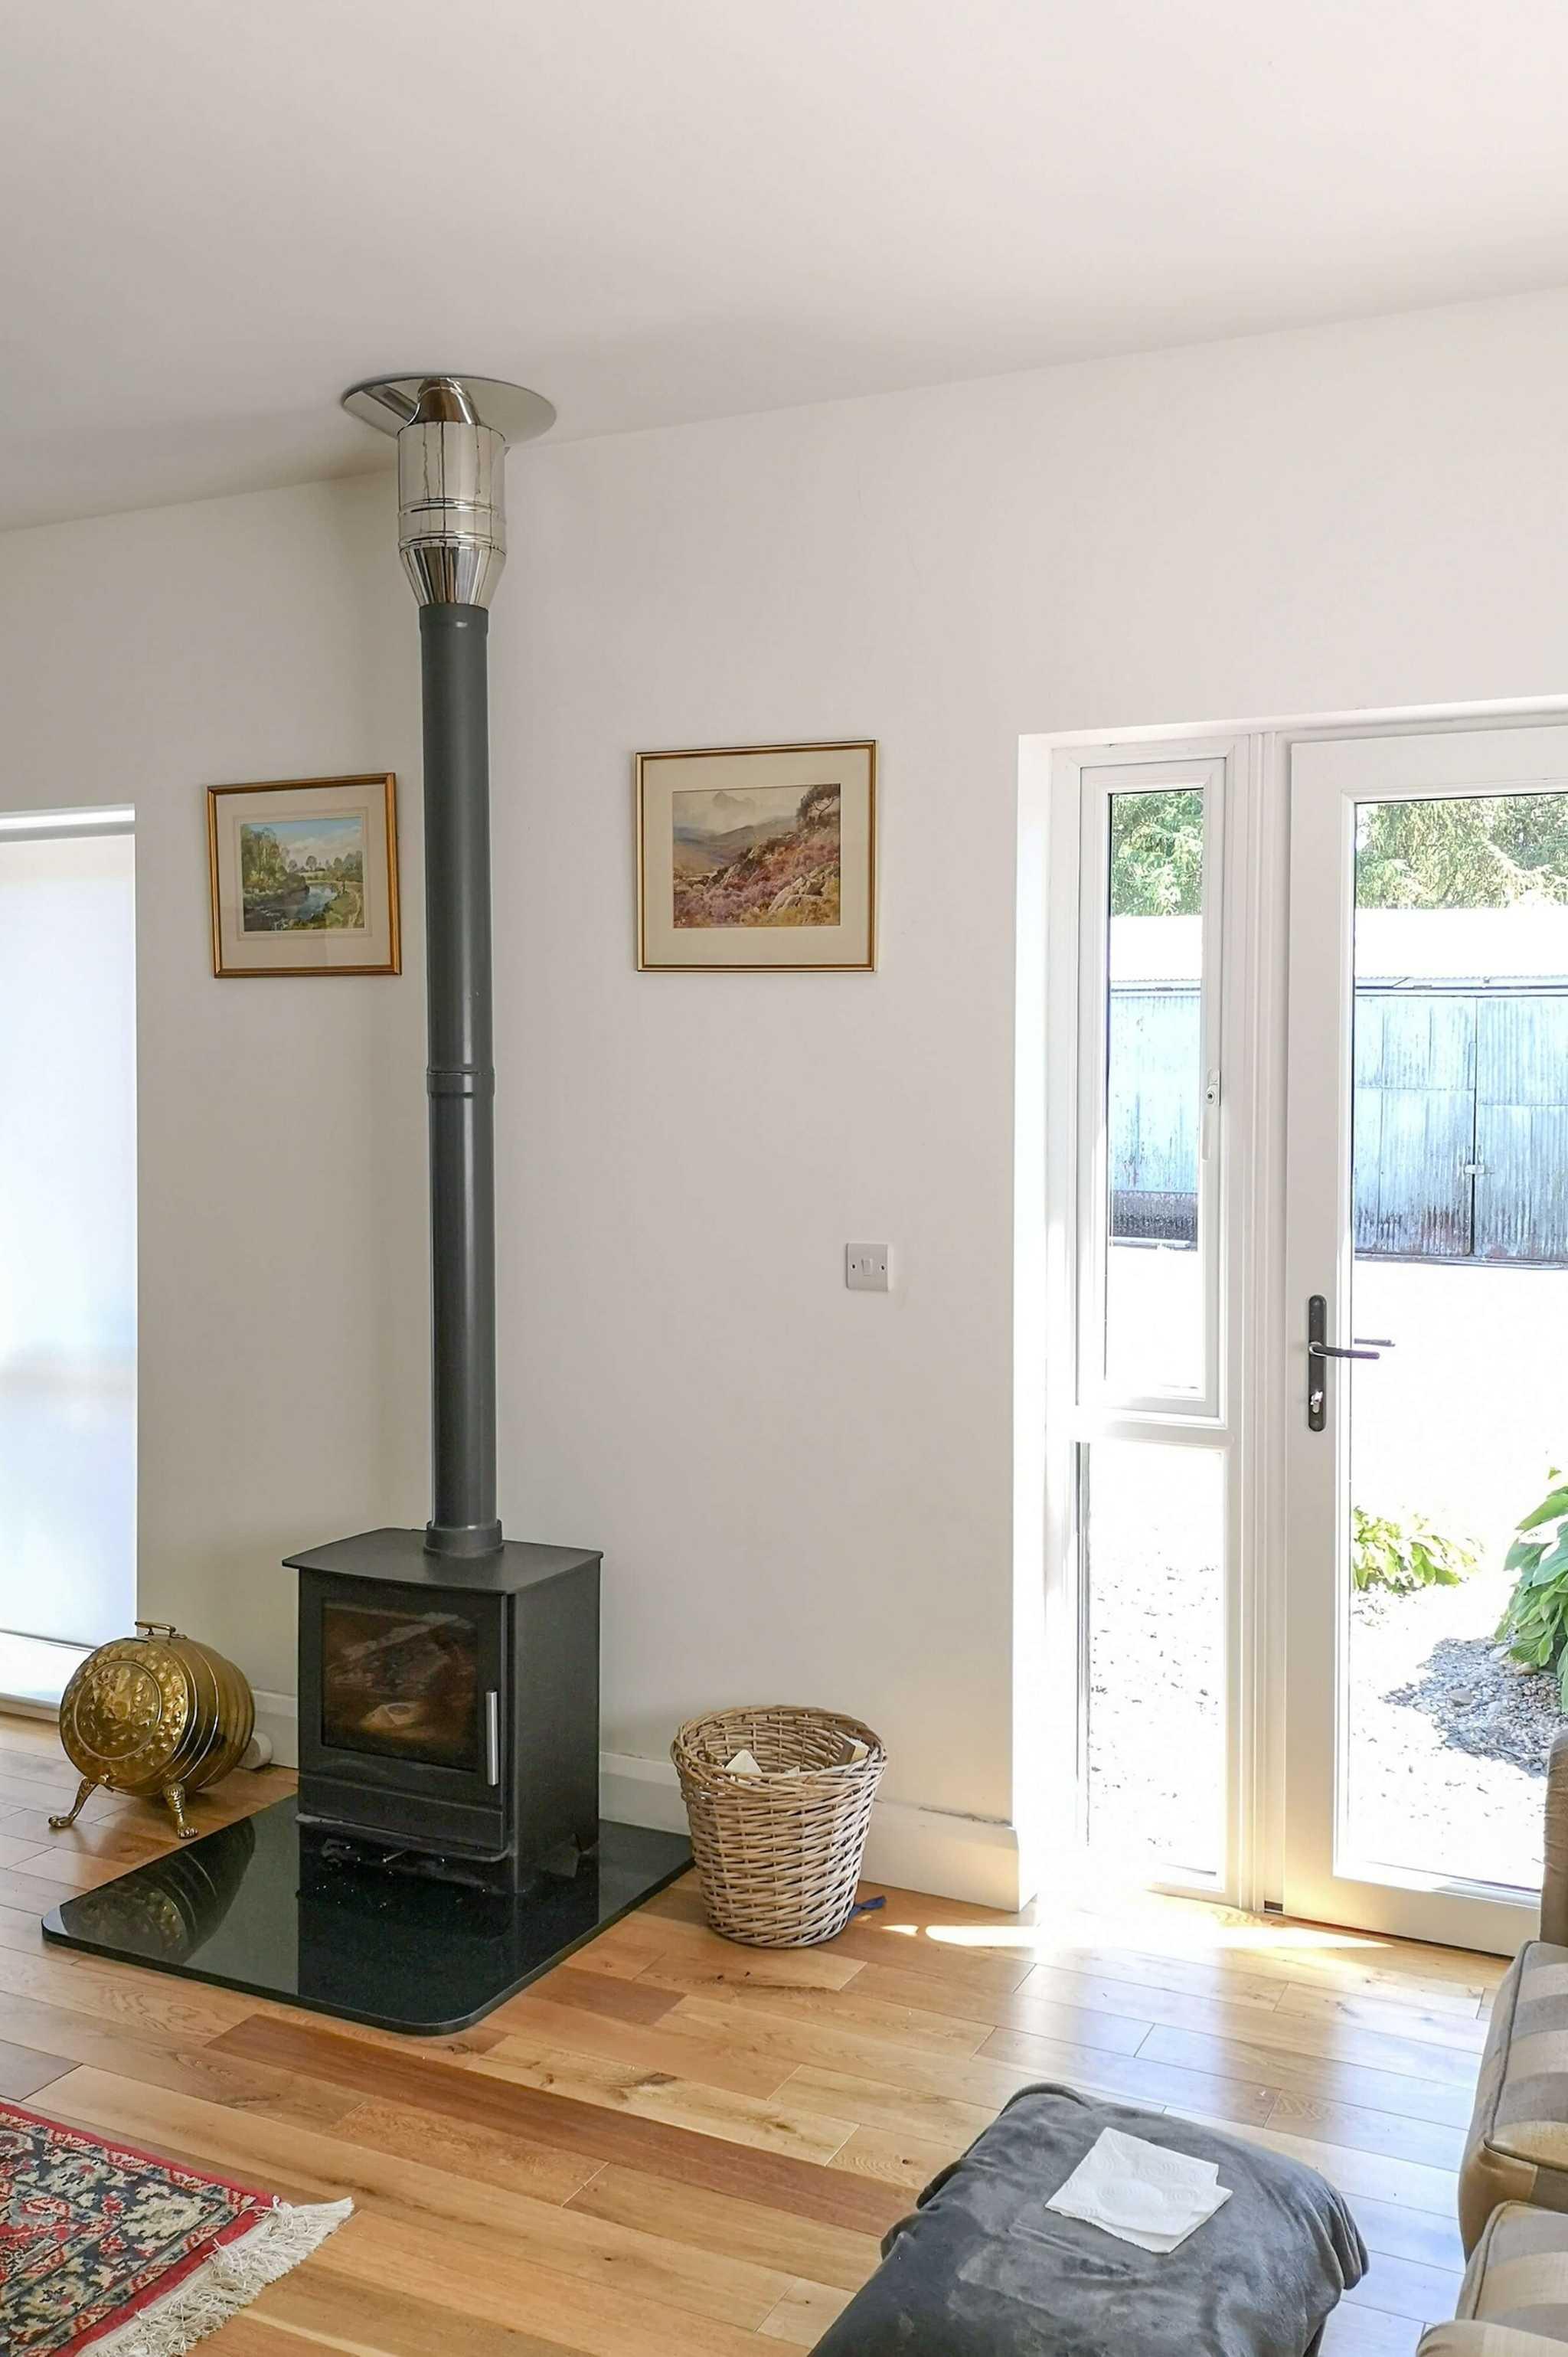 granny flat wood burner stove